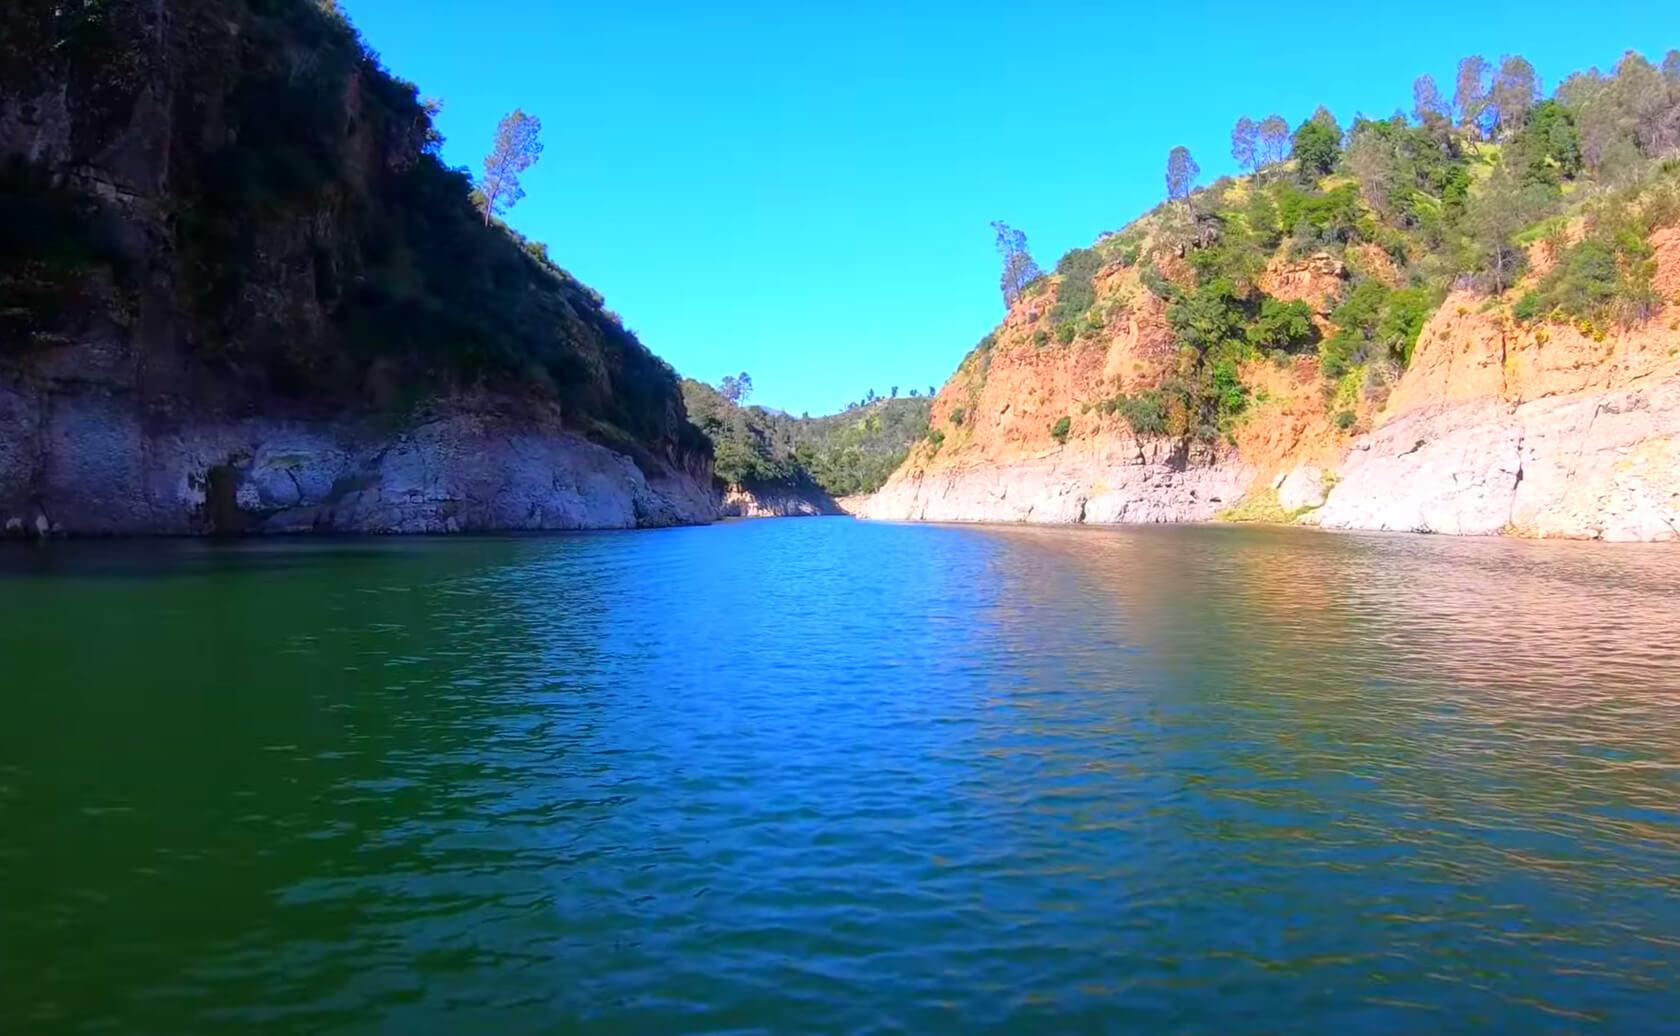 Nacimiento-Lake-Fishing-Guide-Report-California-07